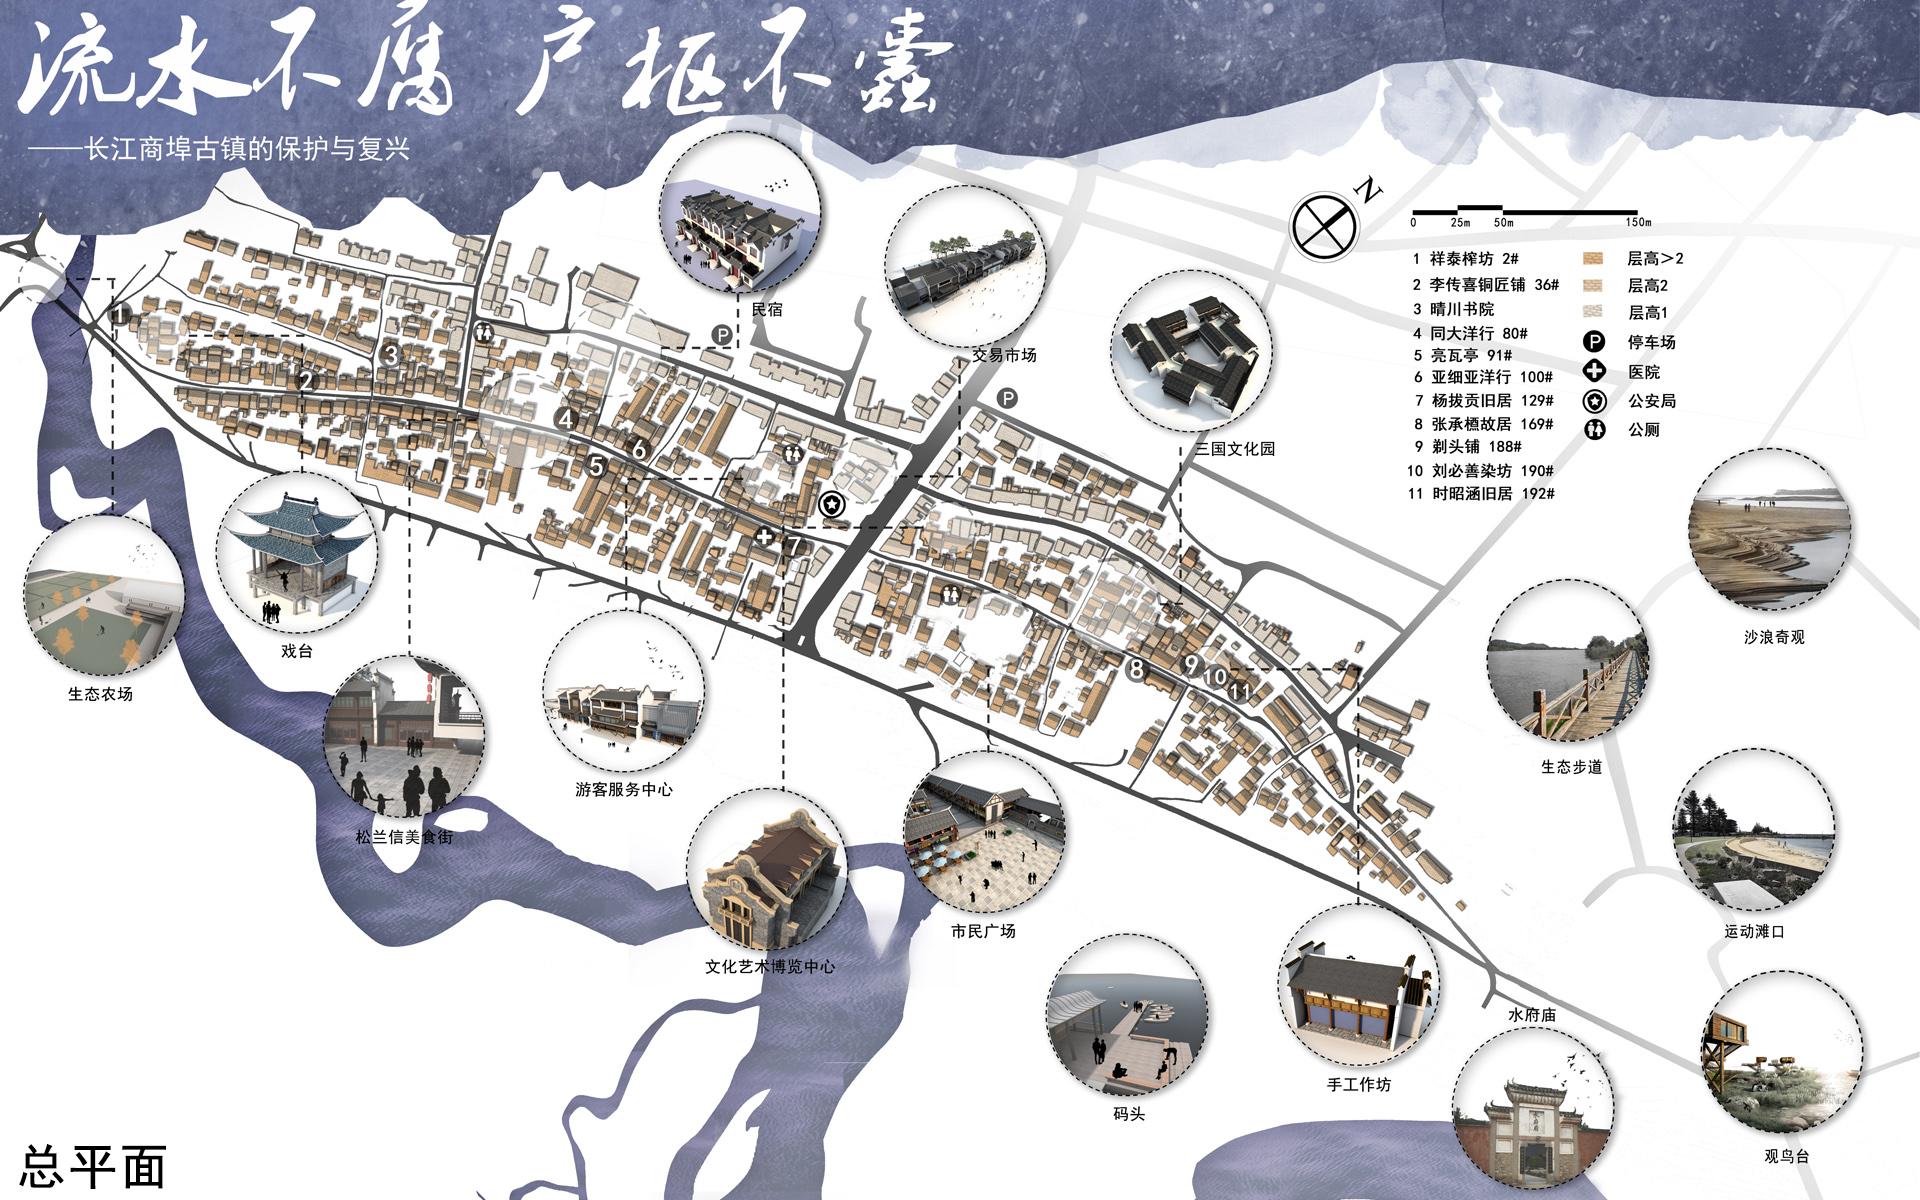 2018LA前锋奖:流水不腐户枢不蠹——长江商埠古镇的维护与复兴